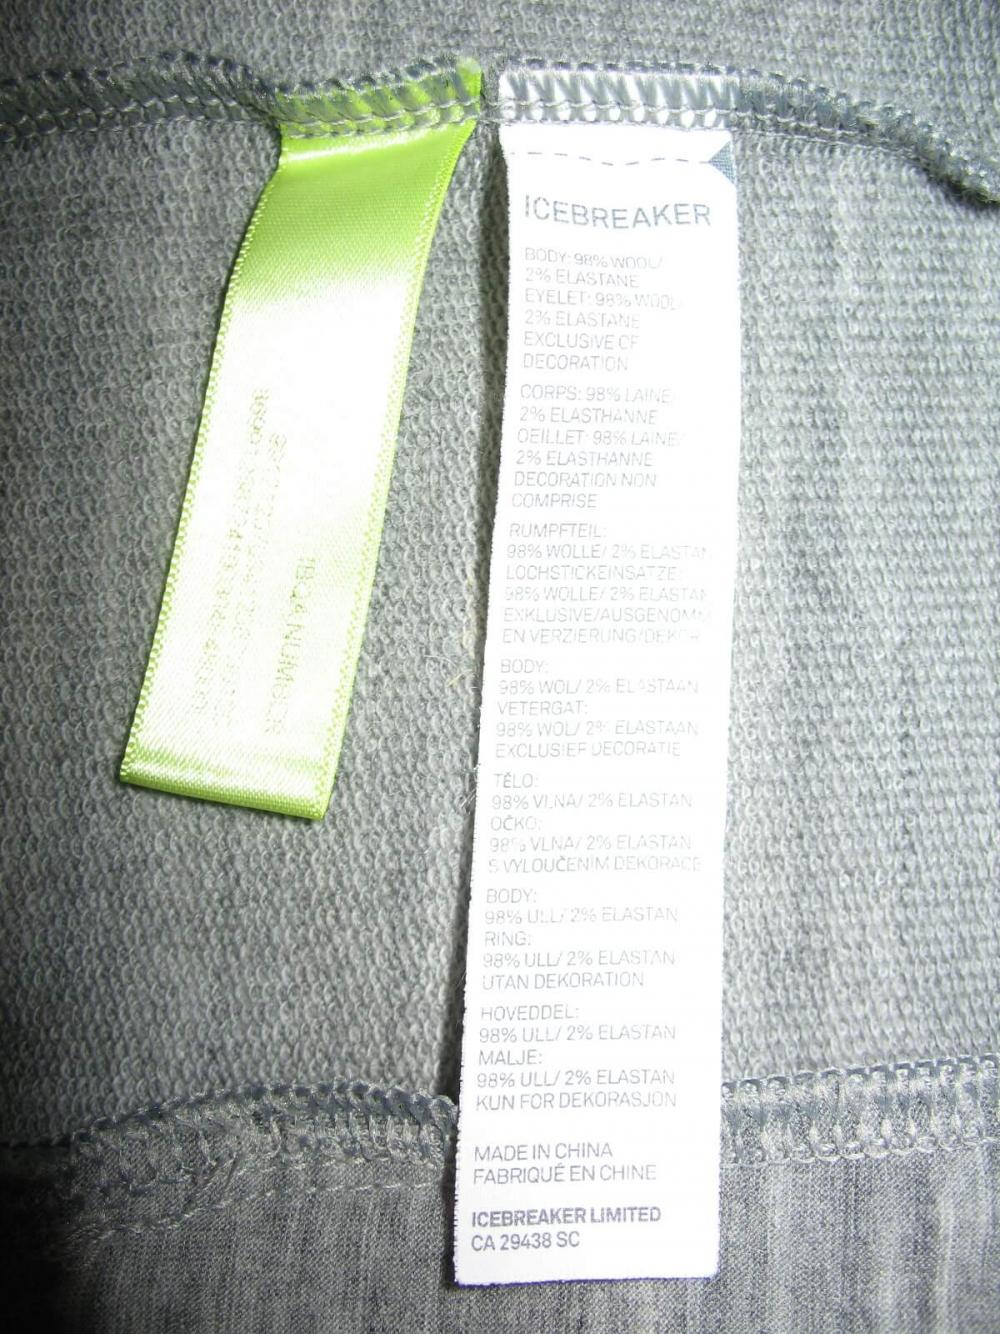 Кофта ICEBREAKER Midweight long sleeve Jacket(размер L) - 11